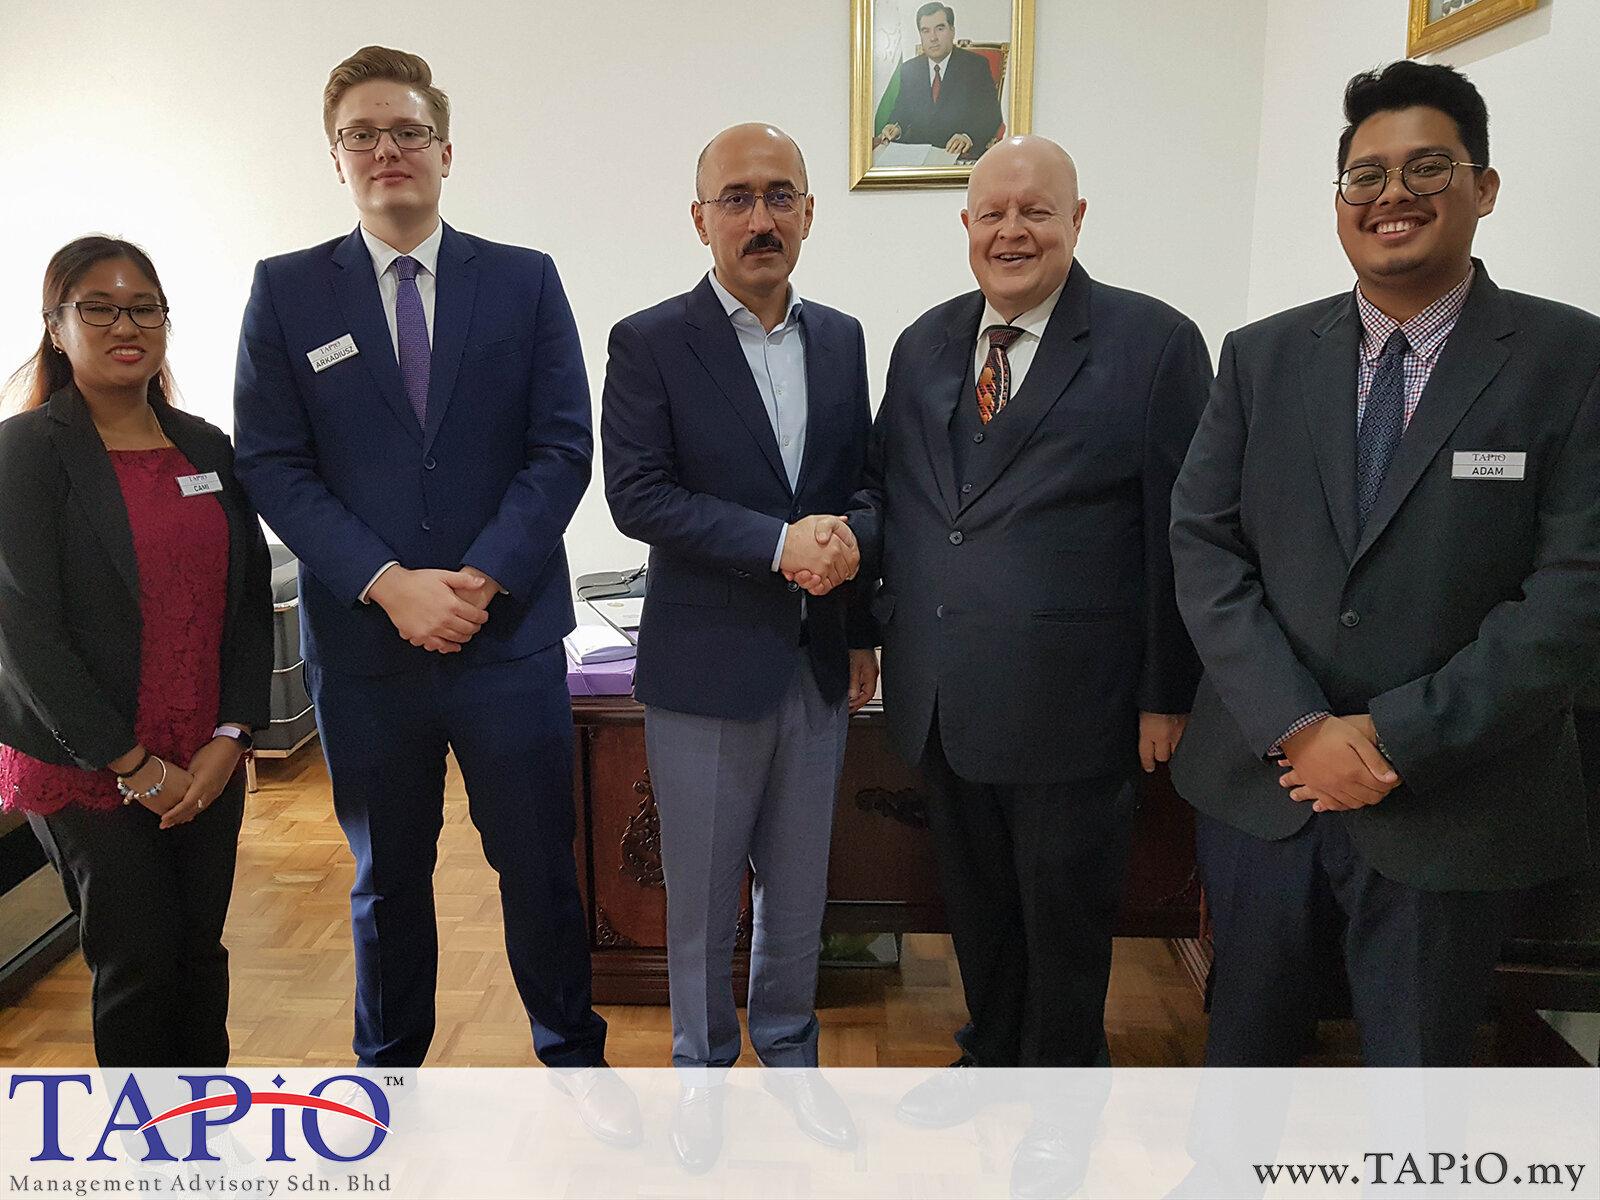 20200121 - Meeting with the Embassy of Tajikistan